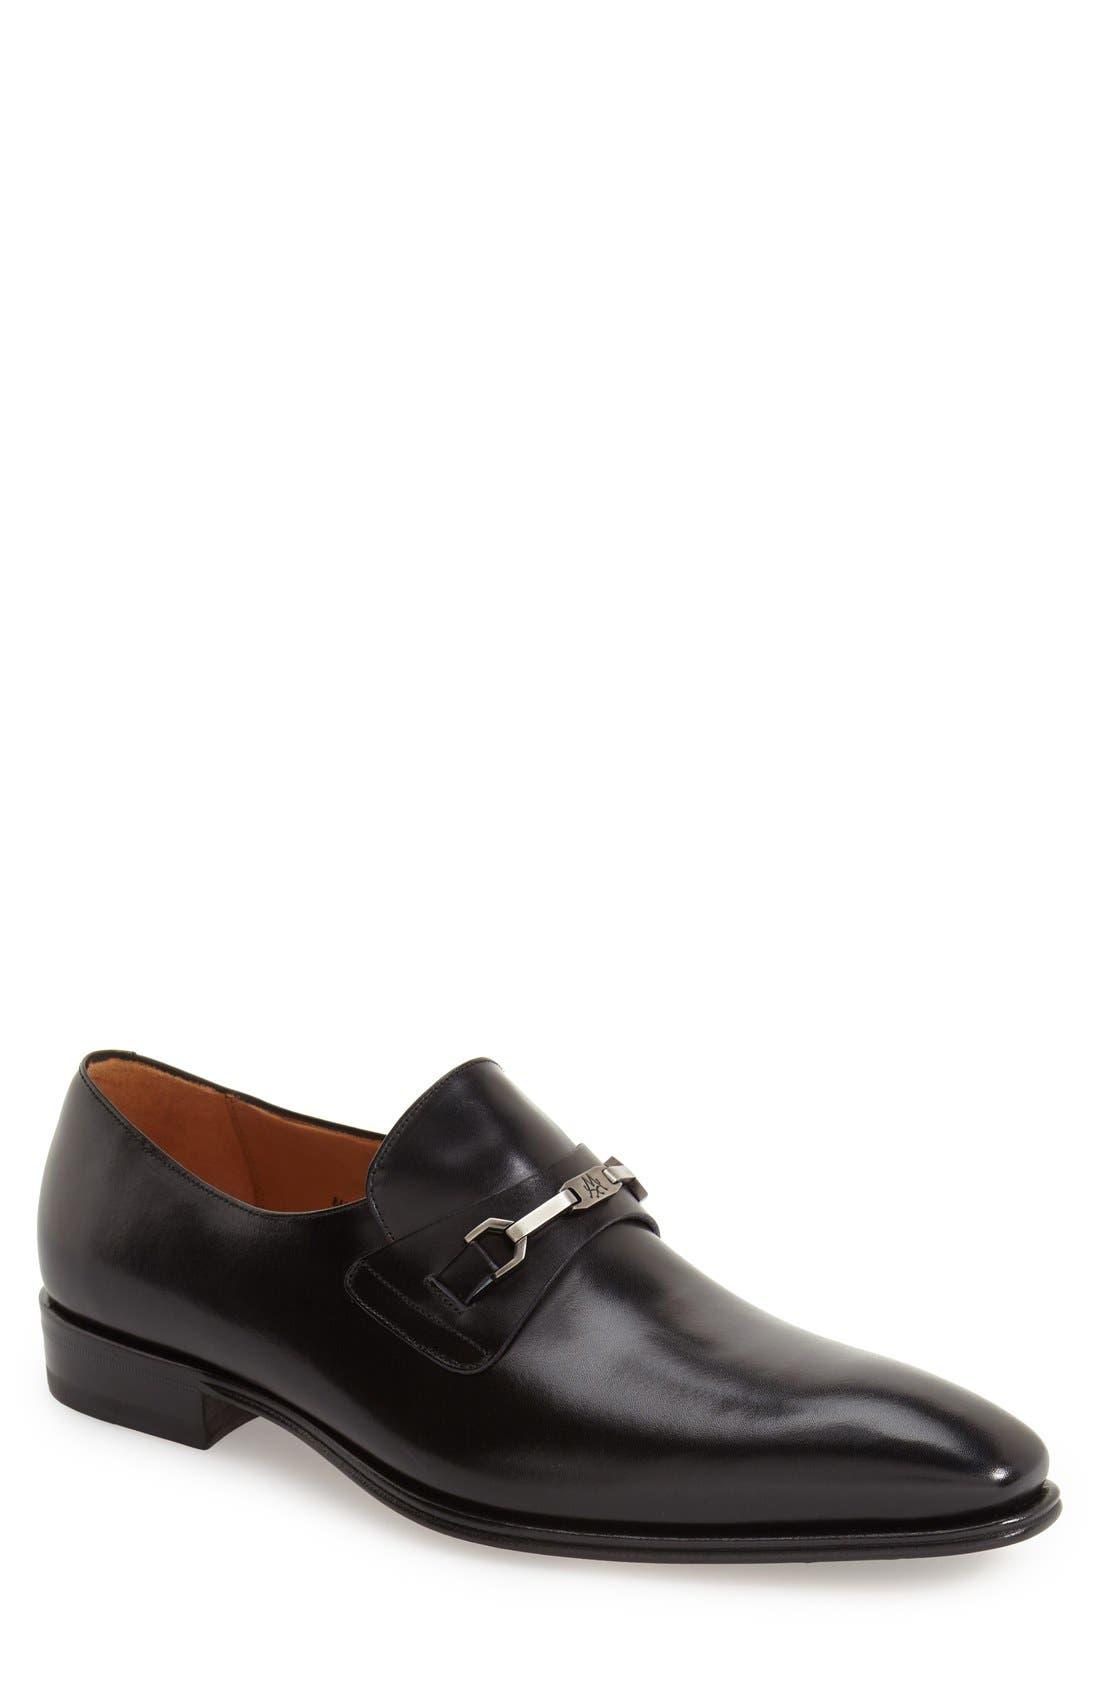 'Doria' Venetian Loafer,                         Main,                         color, Black